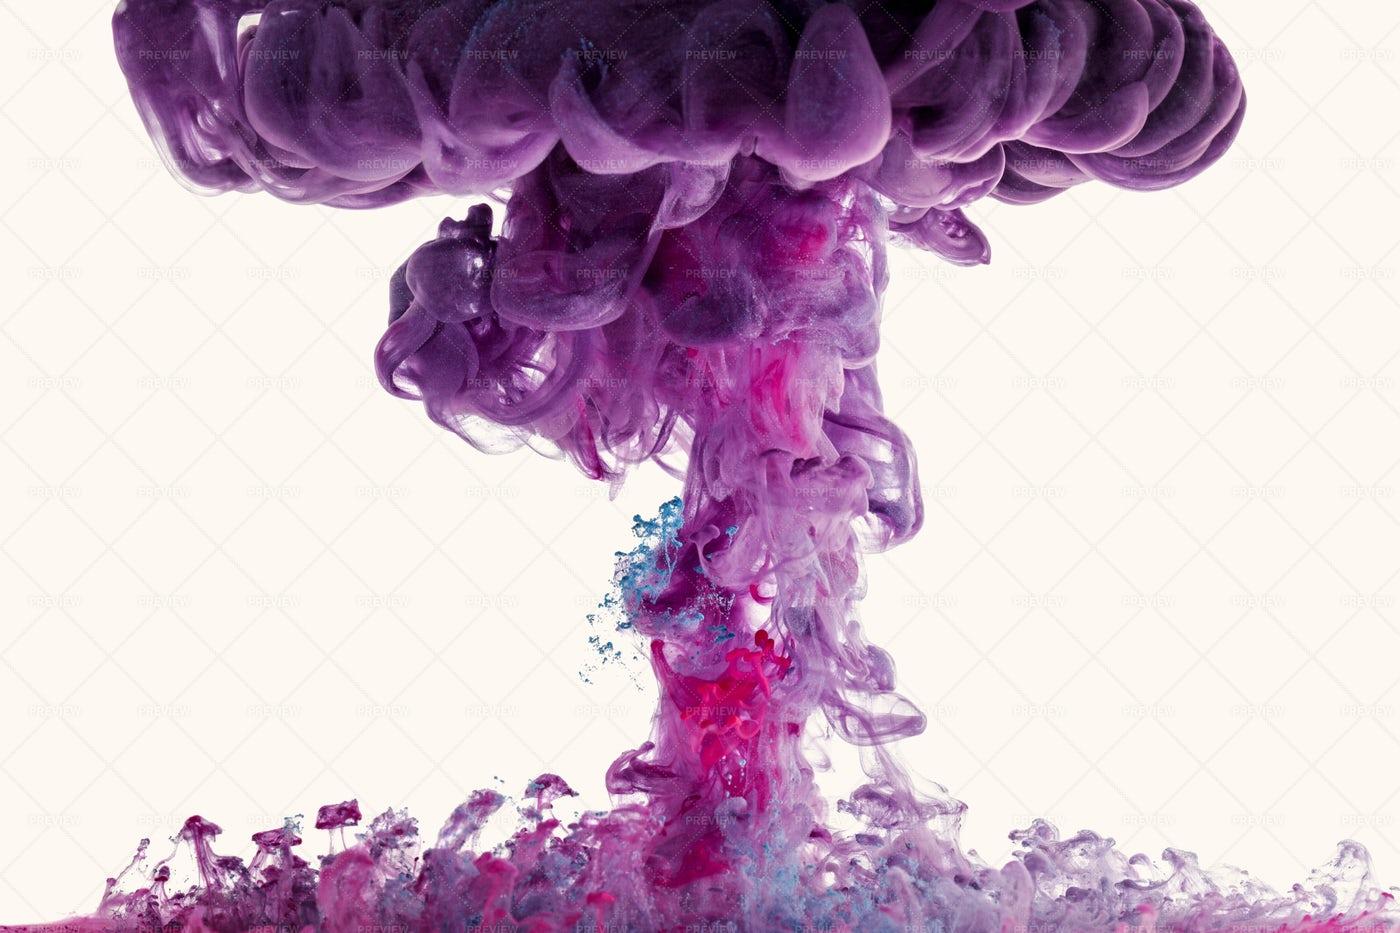 Colorful Mushroom Cloud: Stock Photos